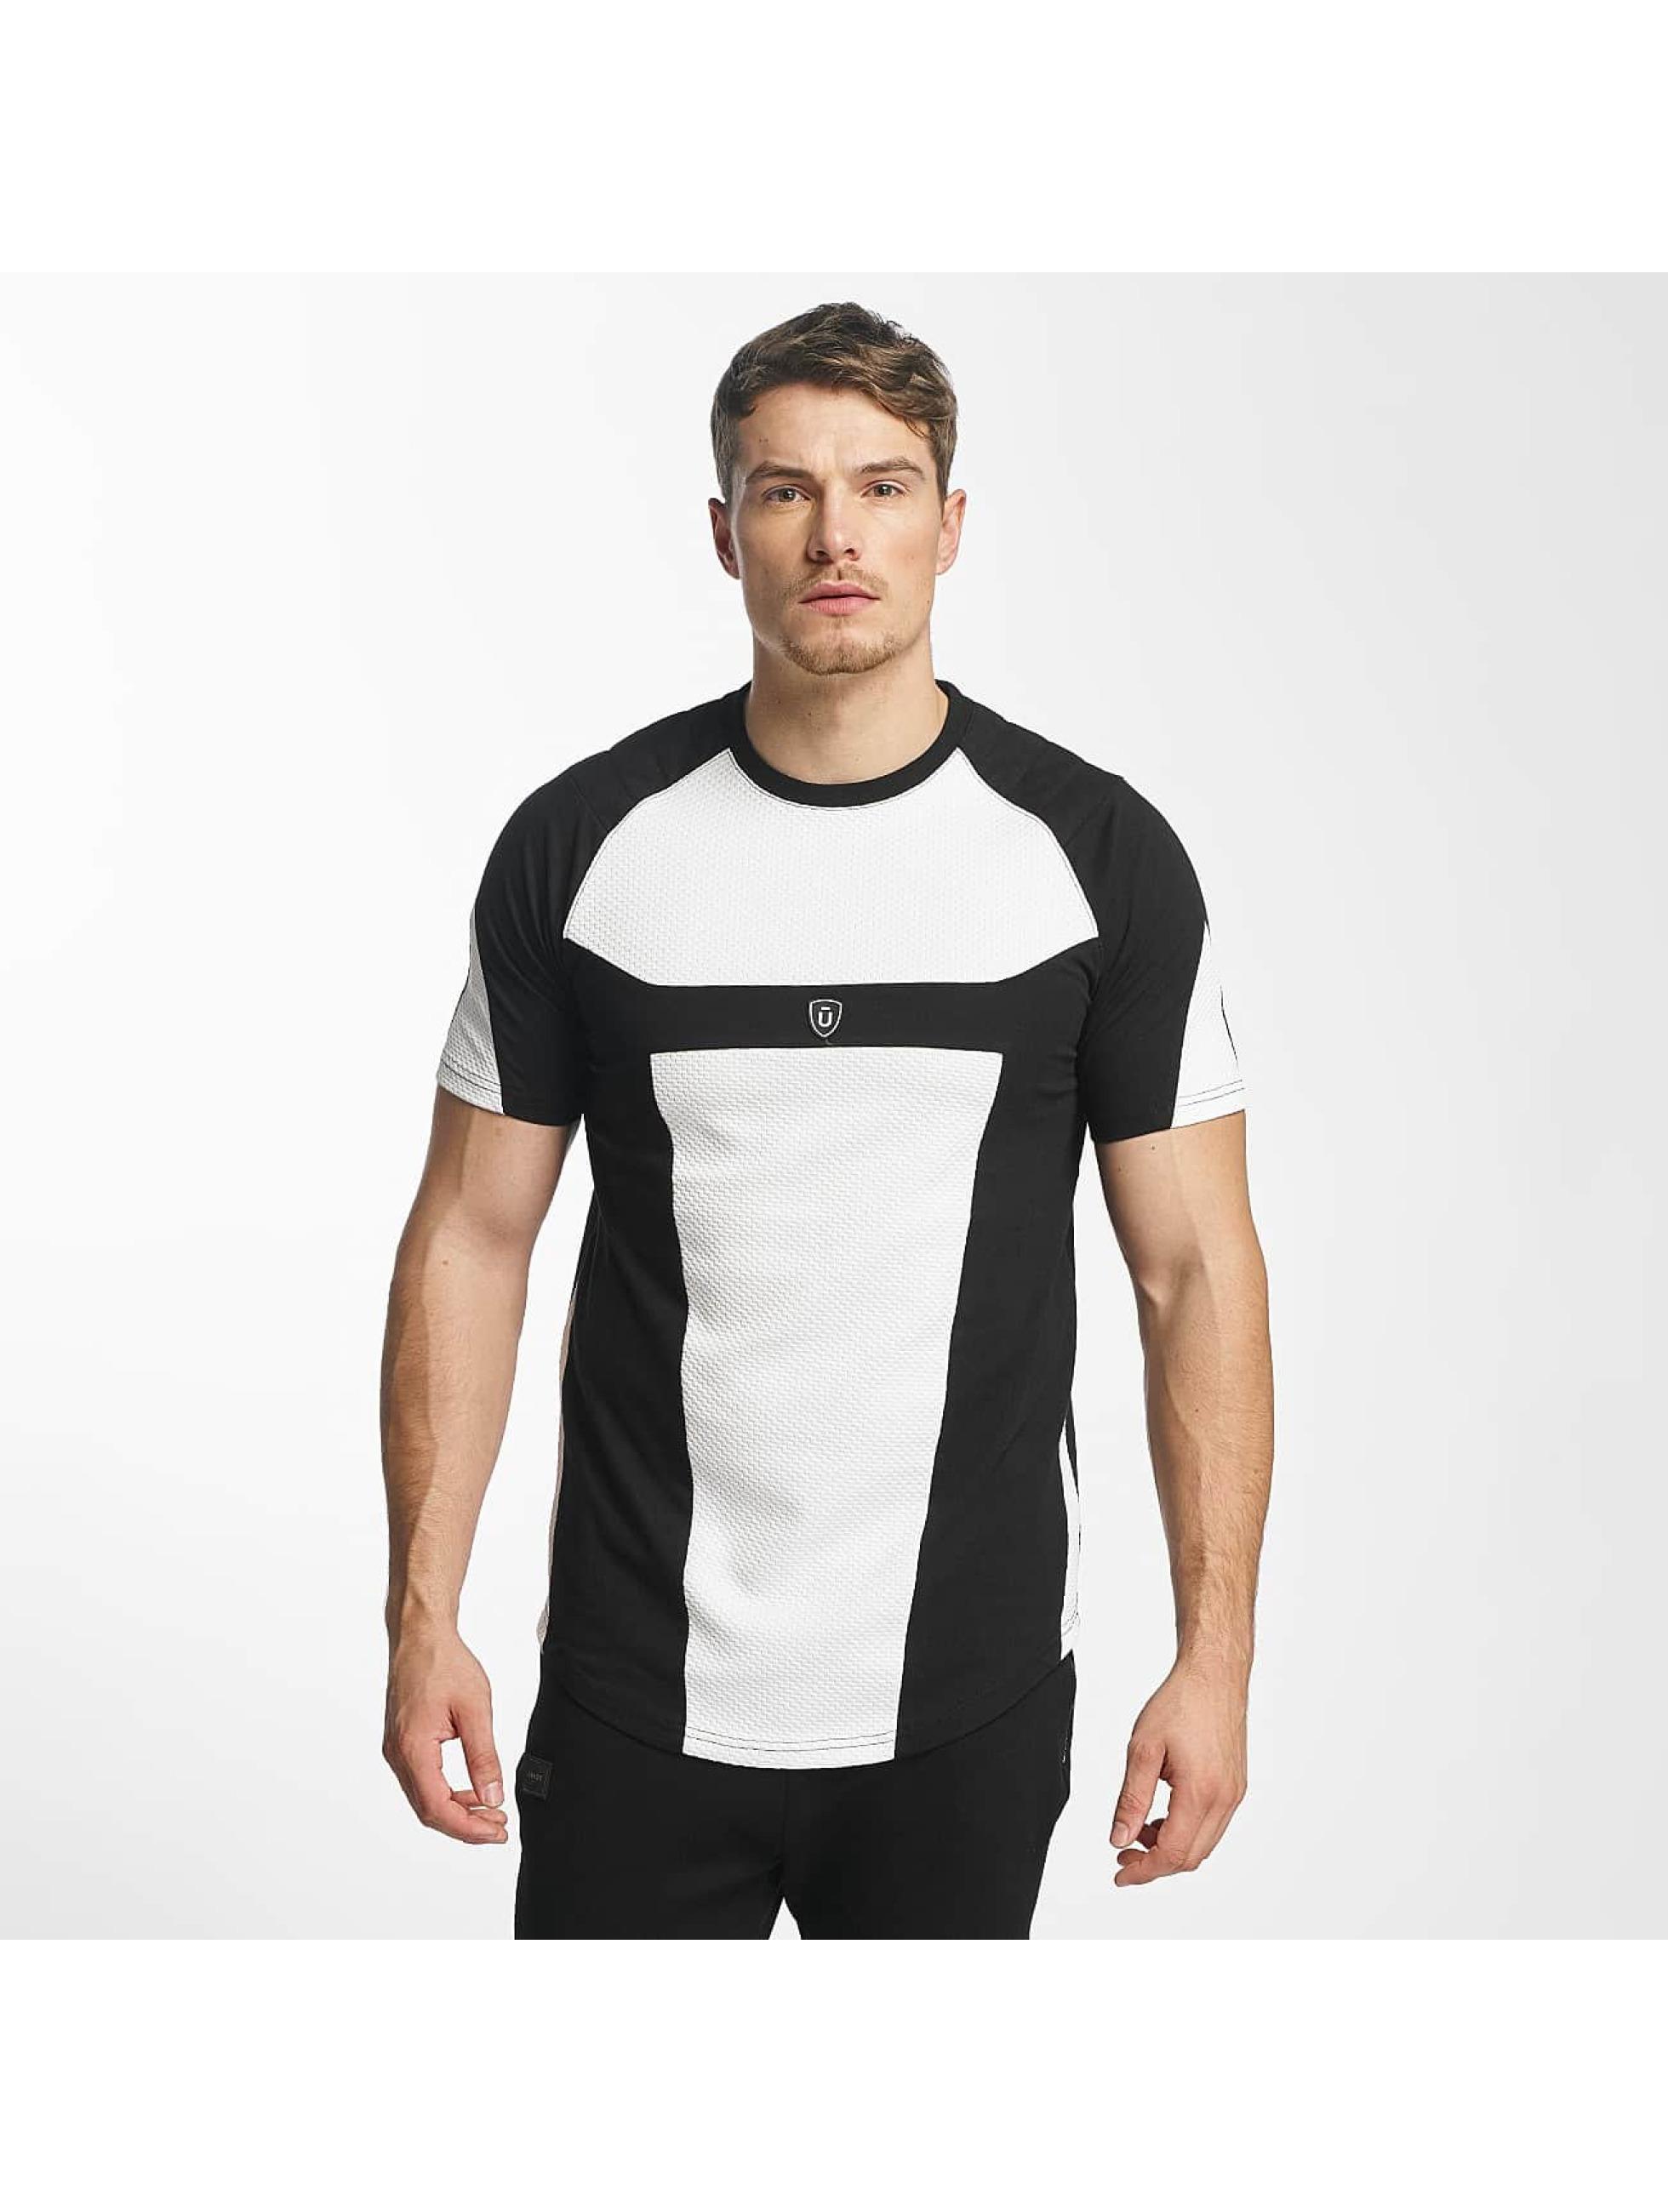 Unkut Männer T-Shirt Break in schwarz